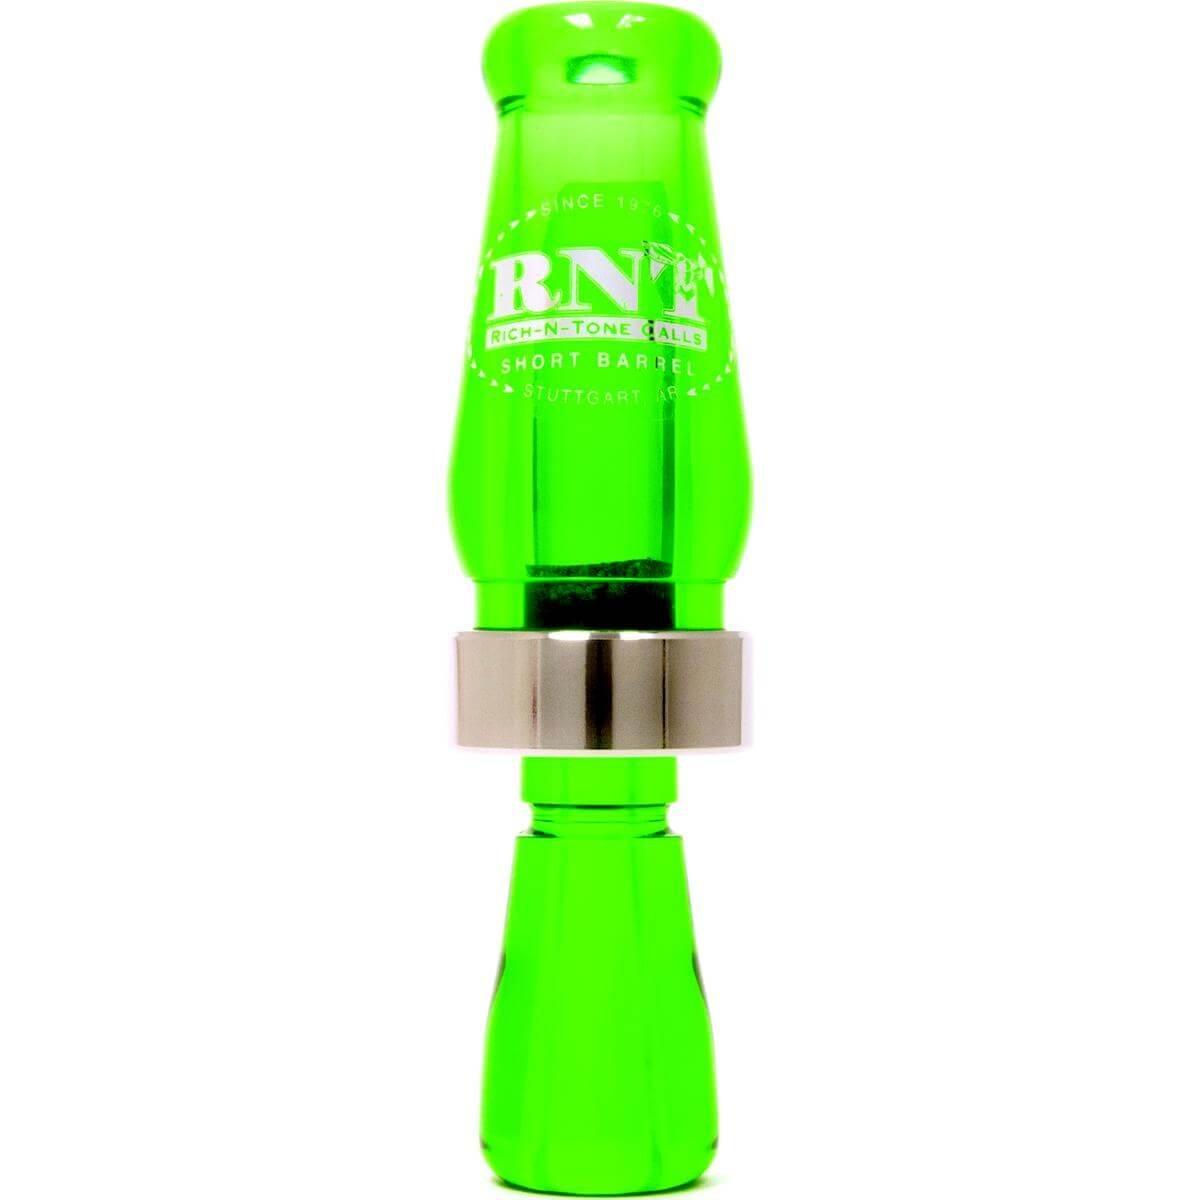 RNT Short Barrel Acrylic Duck Call Kelly Green